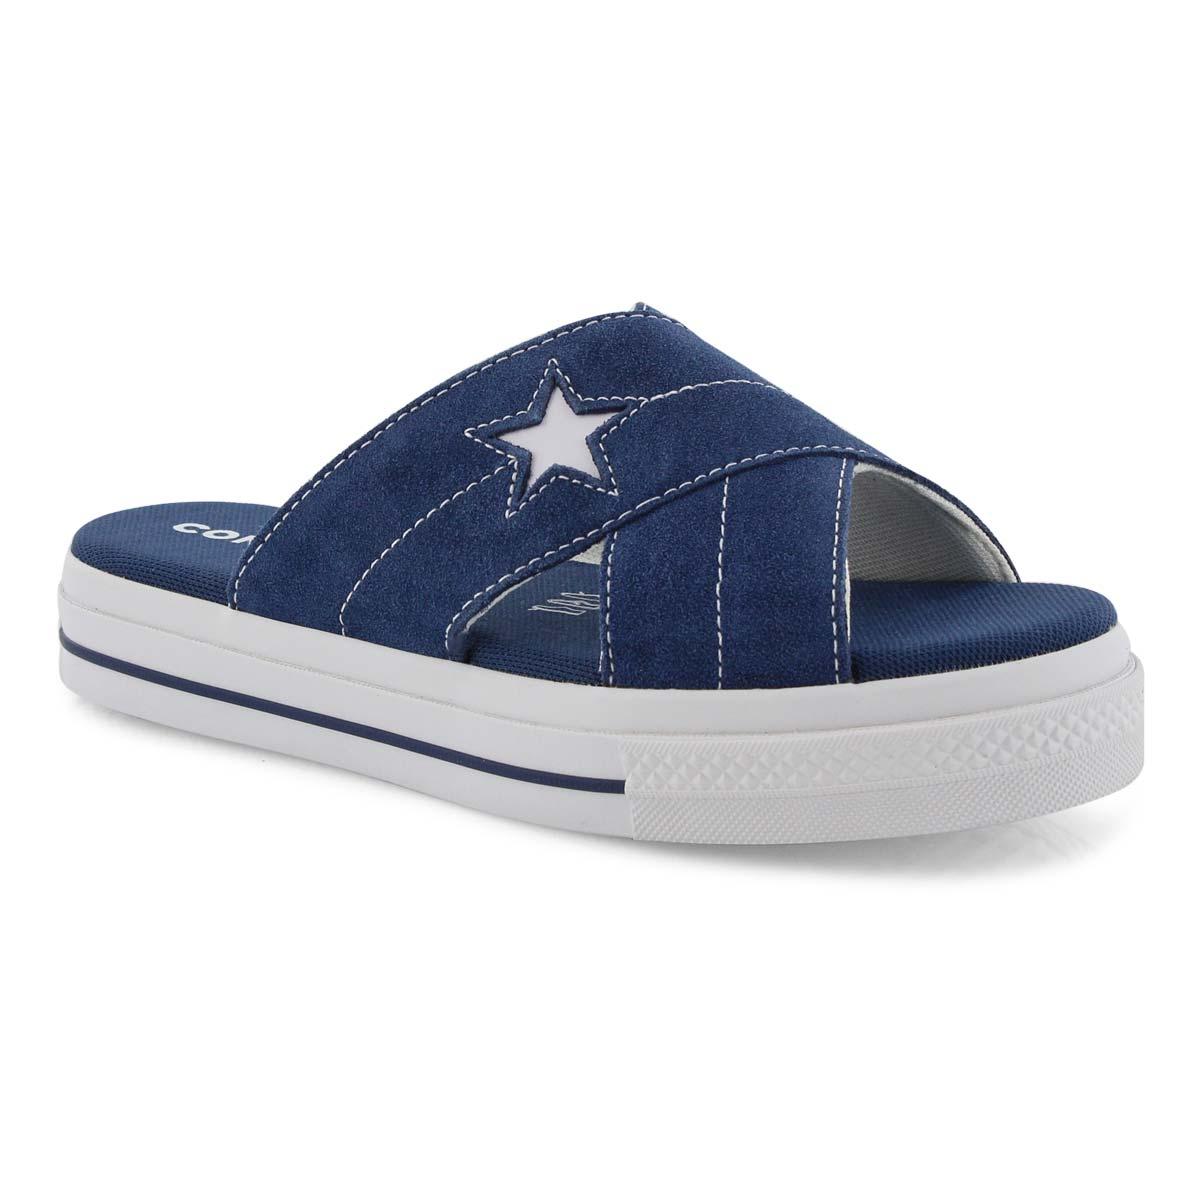 Lds One Star nvy casual slide sandal